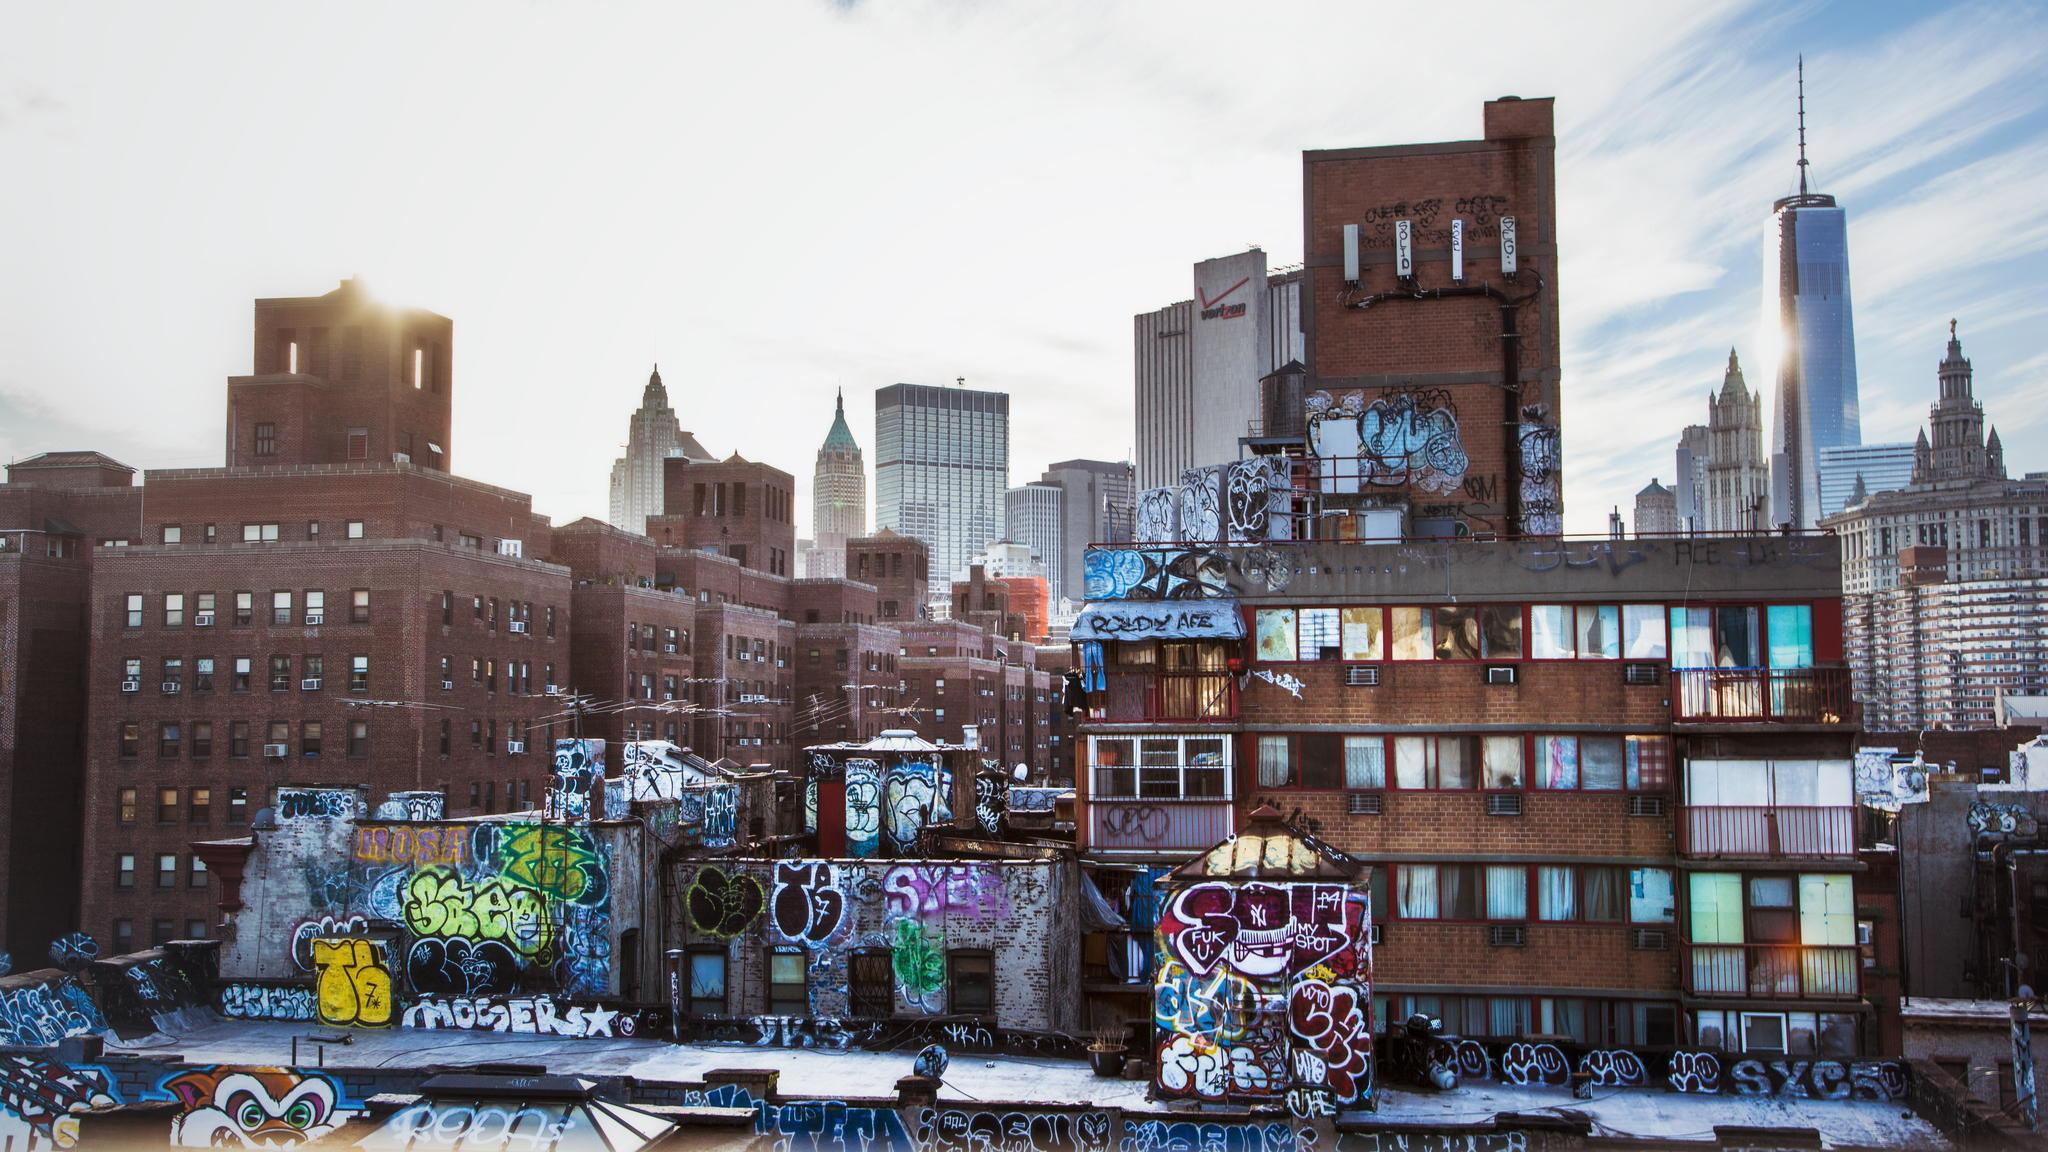 Wallpapers For Desktop Fall Colors Graffiti City Wallpapers Hd Download Free Pixelstalk Net